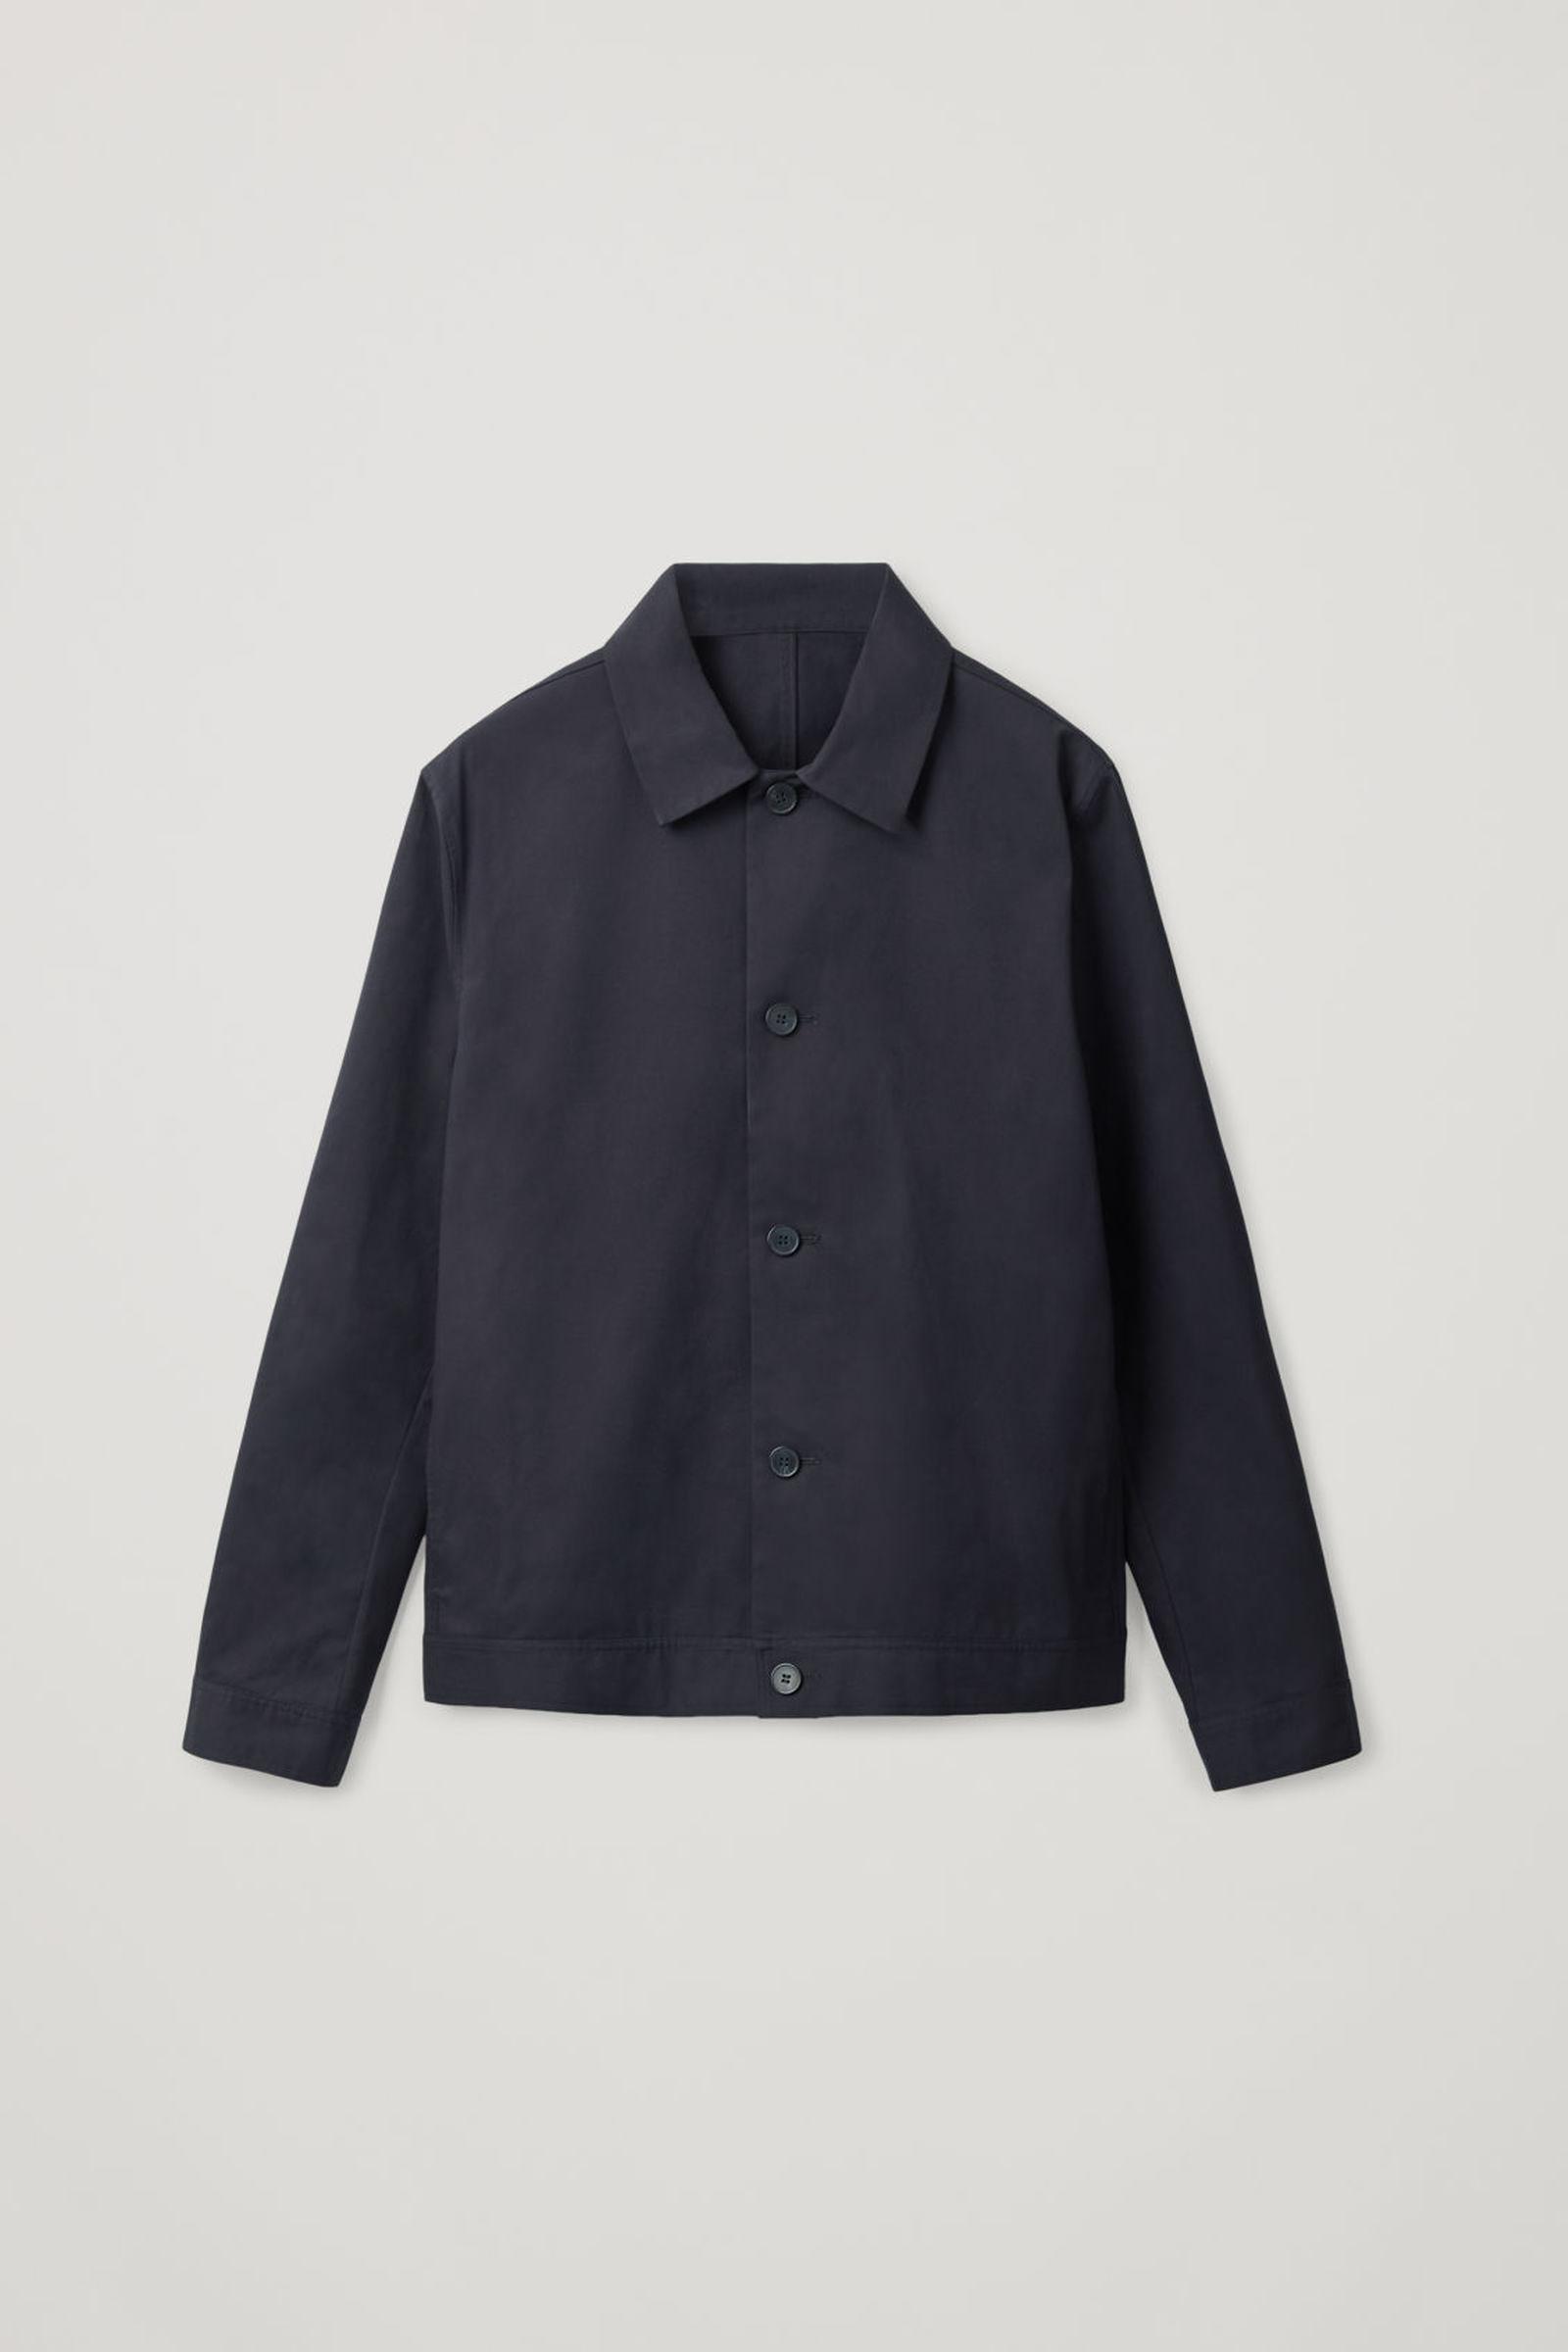 COS 오가닉 코튼 재킷의 네이비컬러 Product입니다.